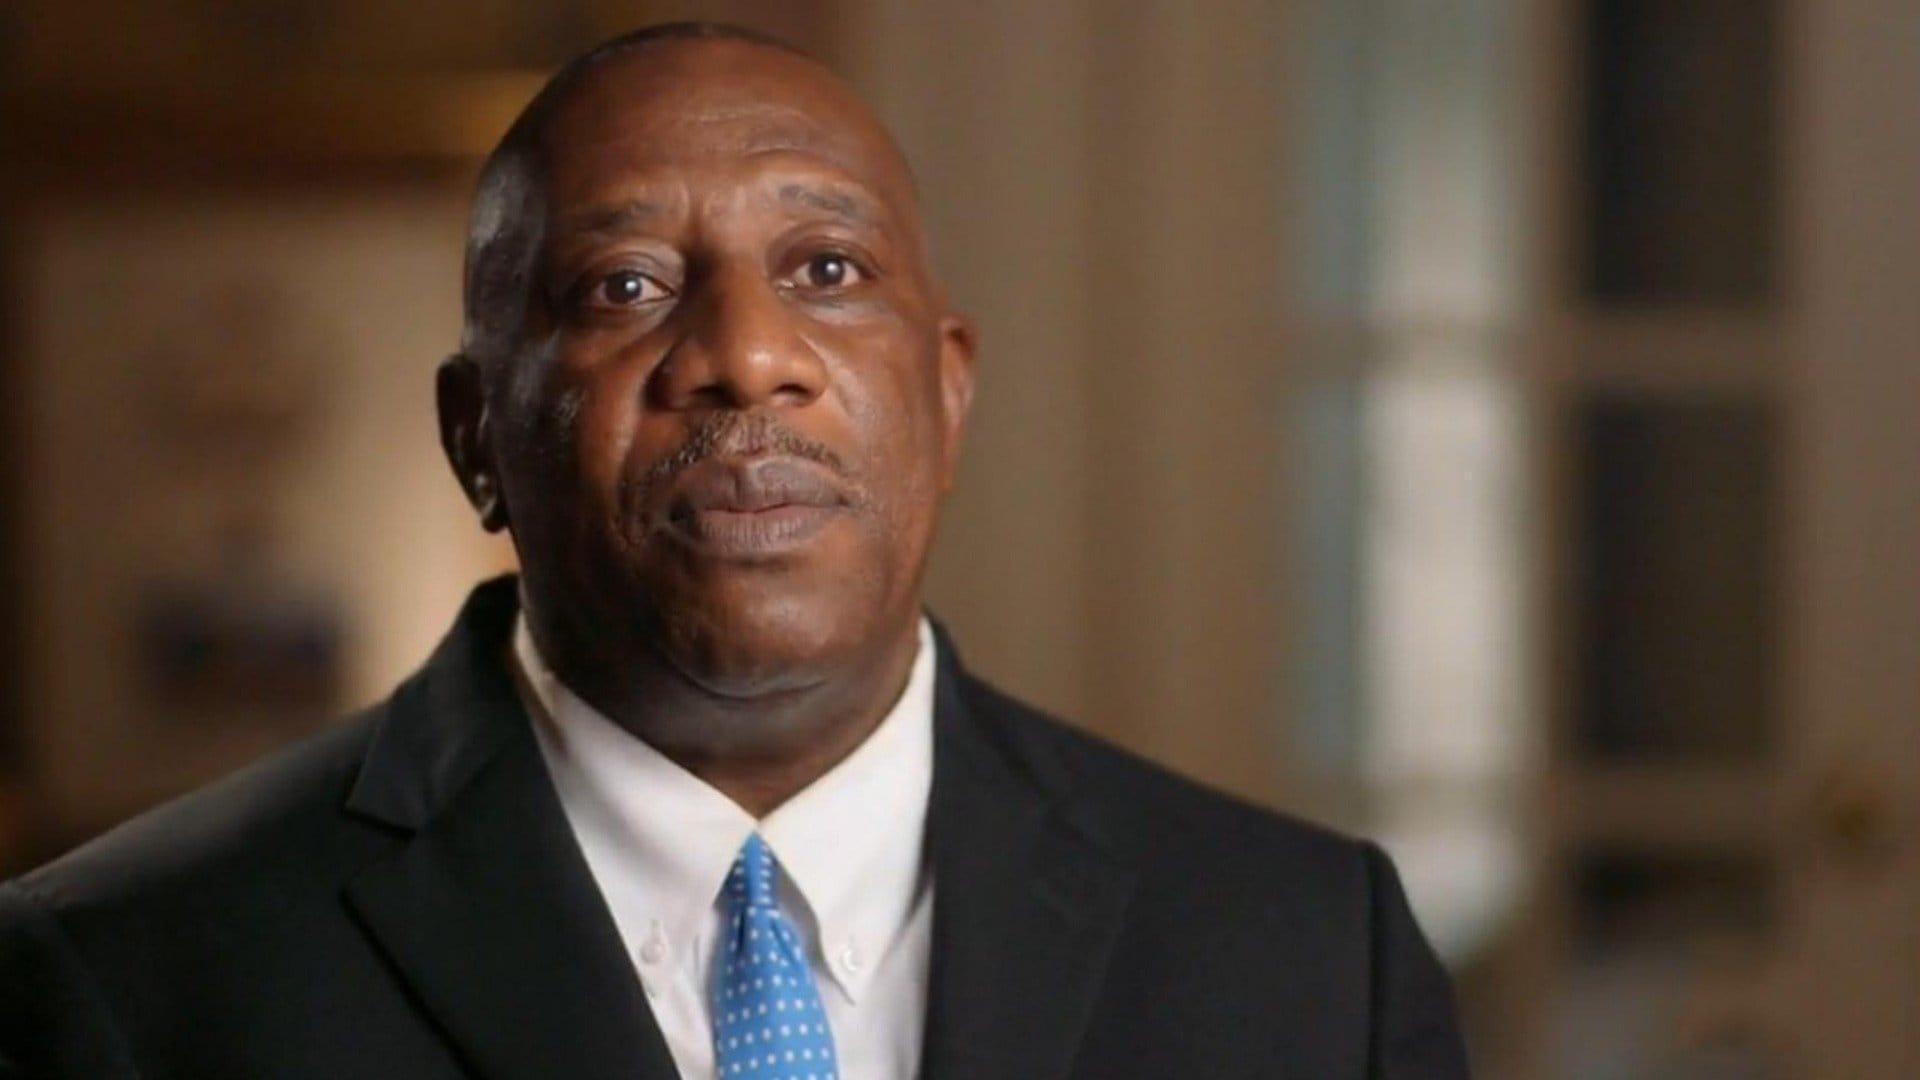 Ray Nagin: New Orleans Shakedown